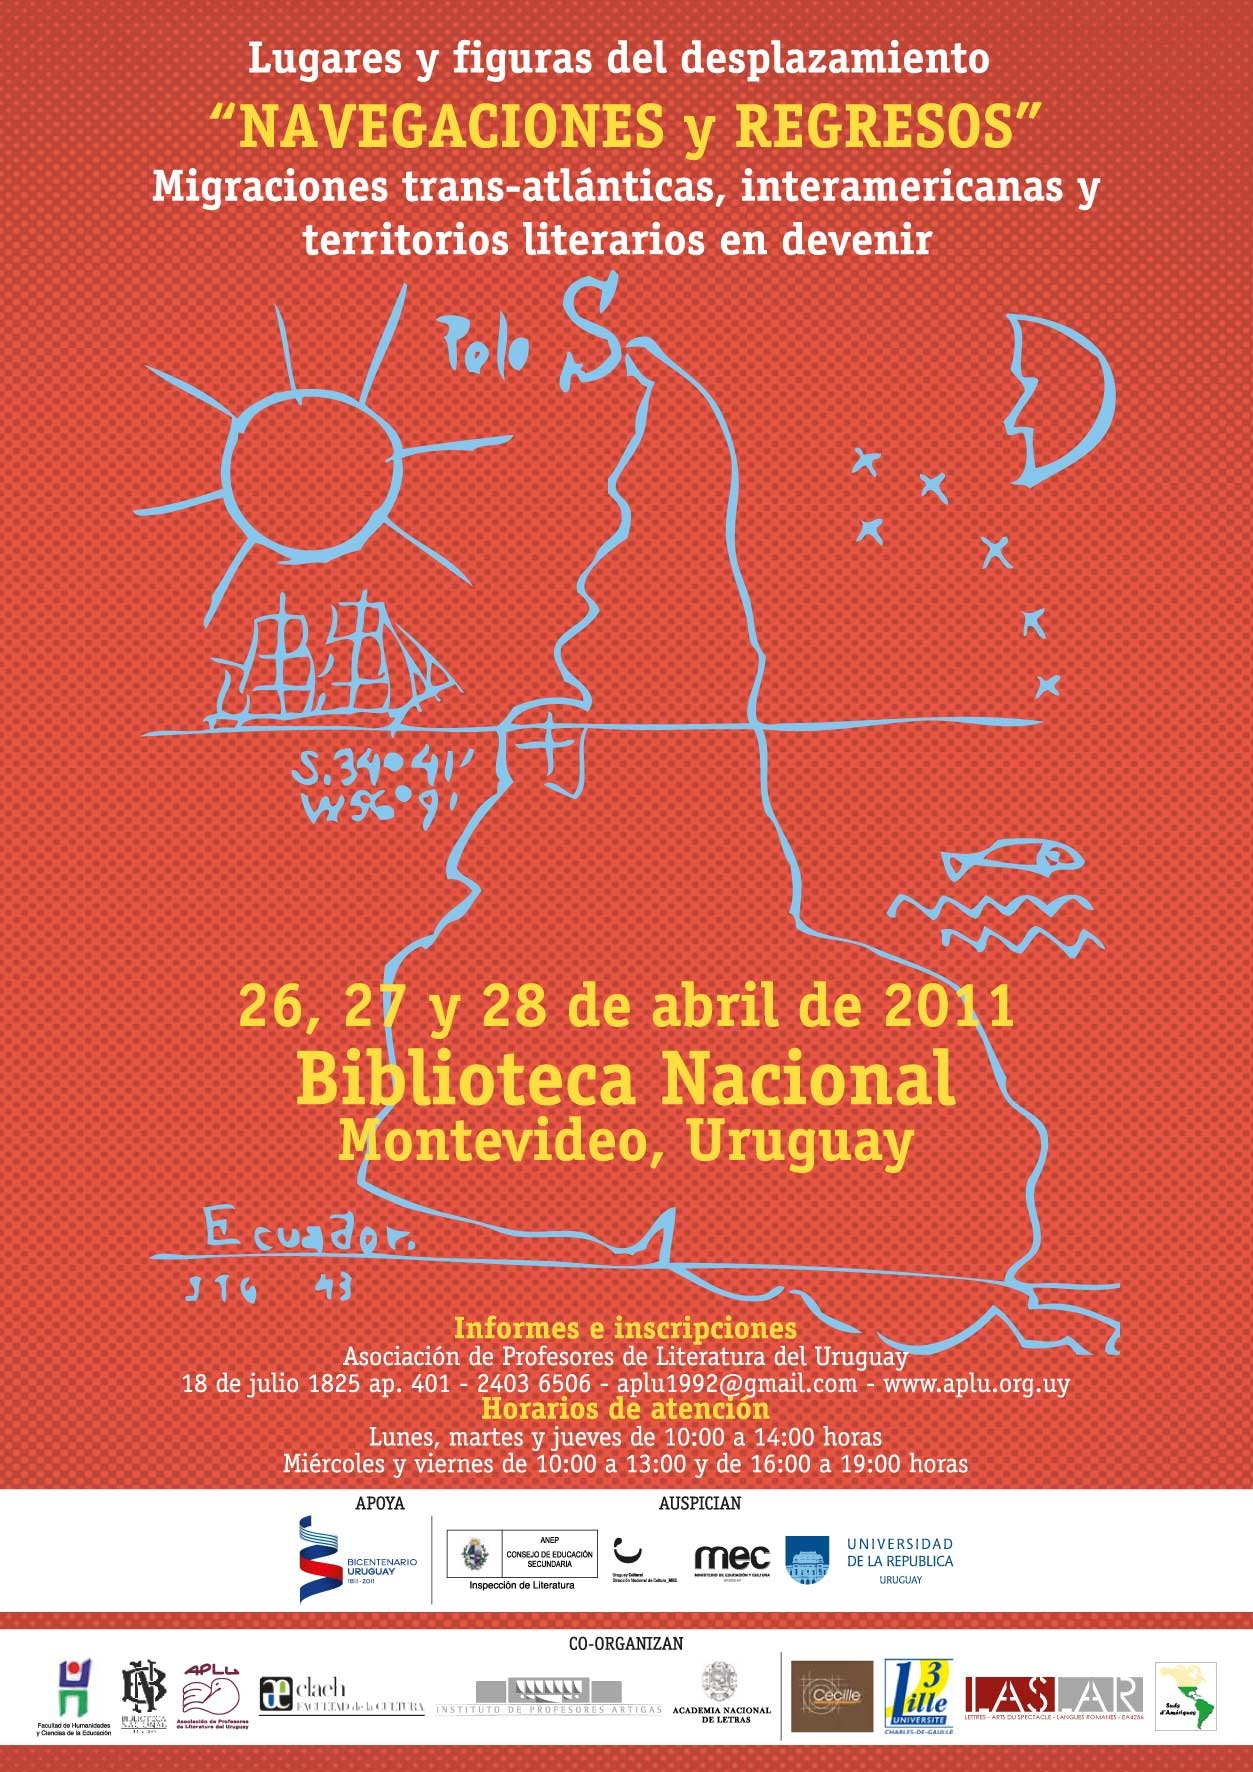 Affiche Montevideo